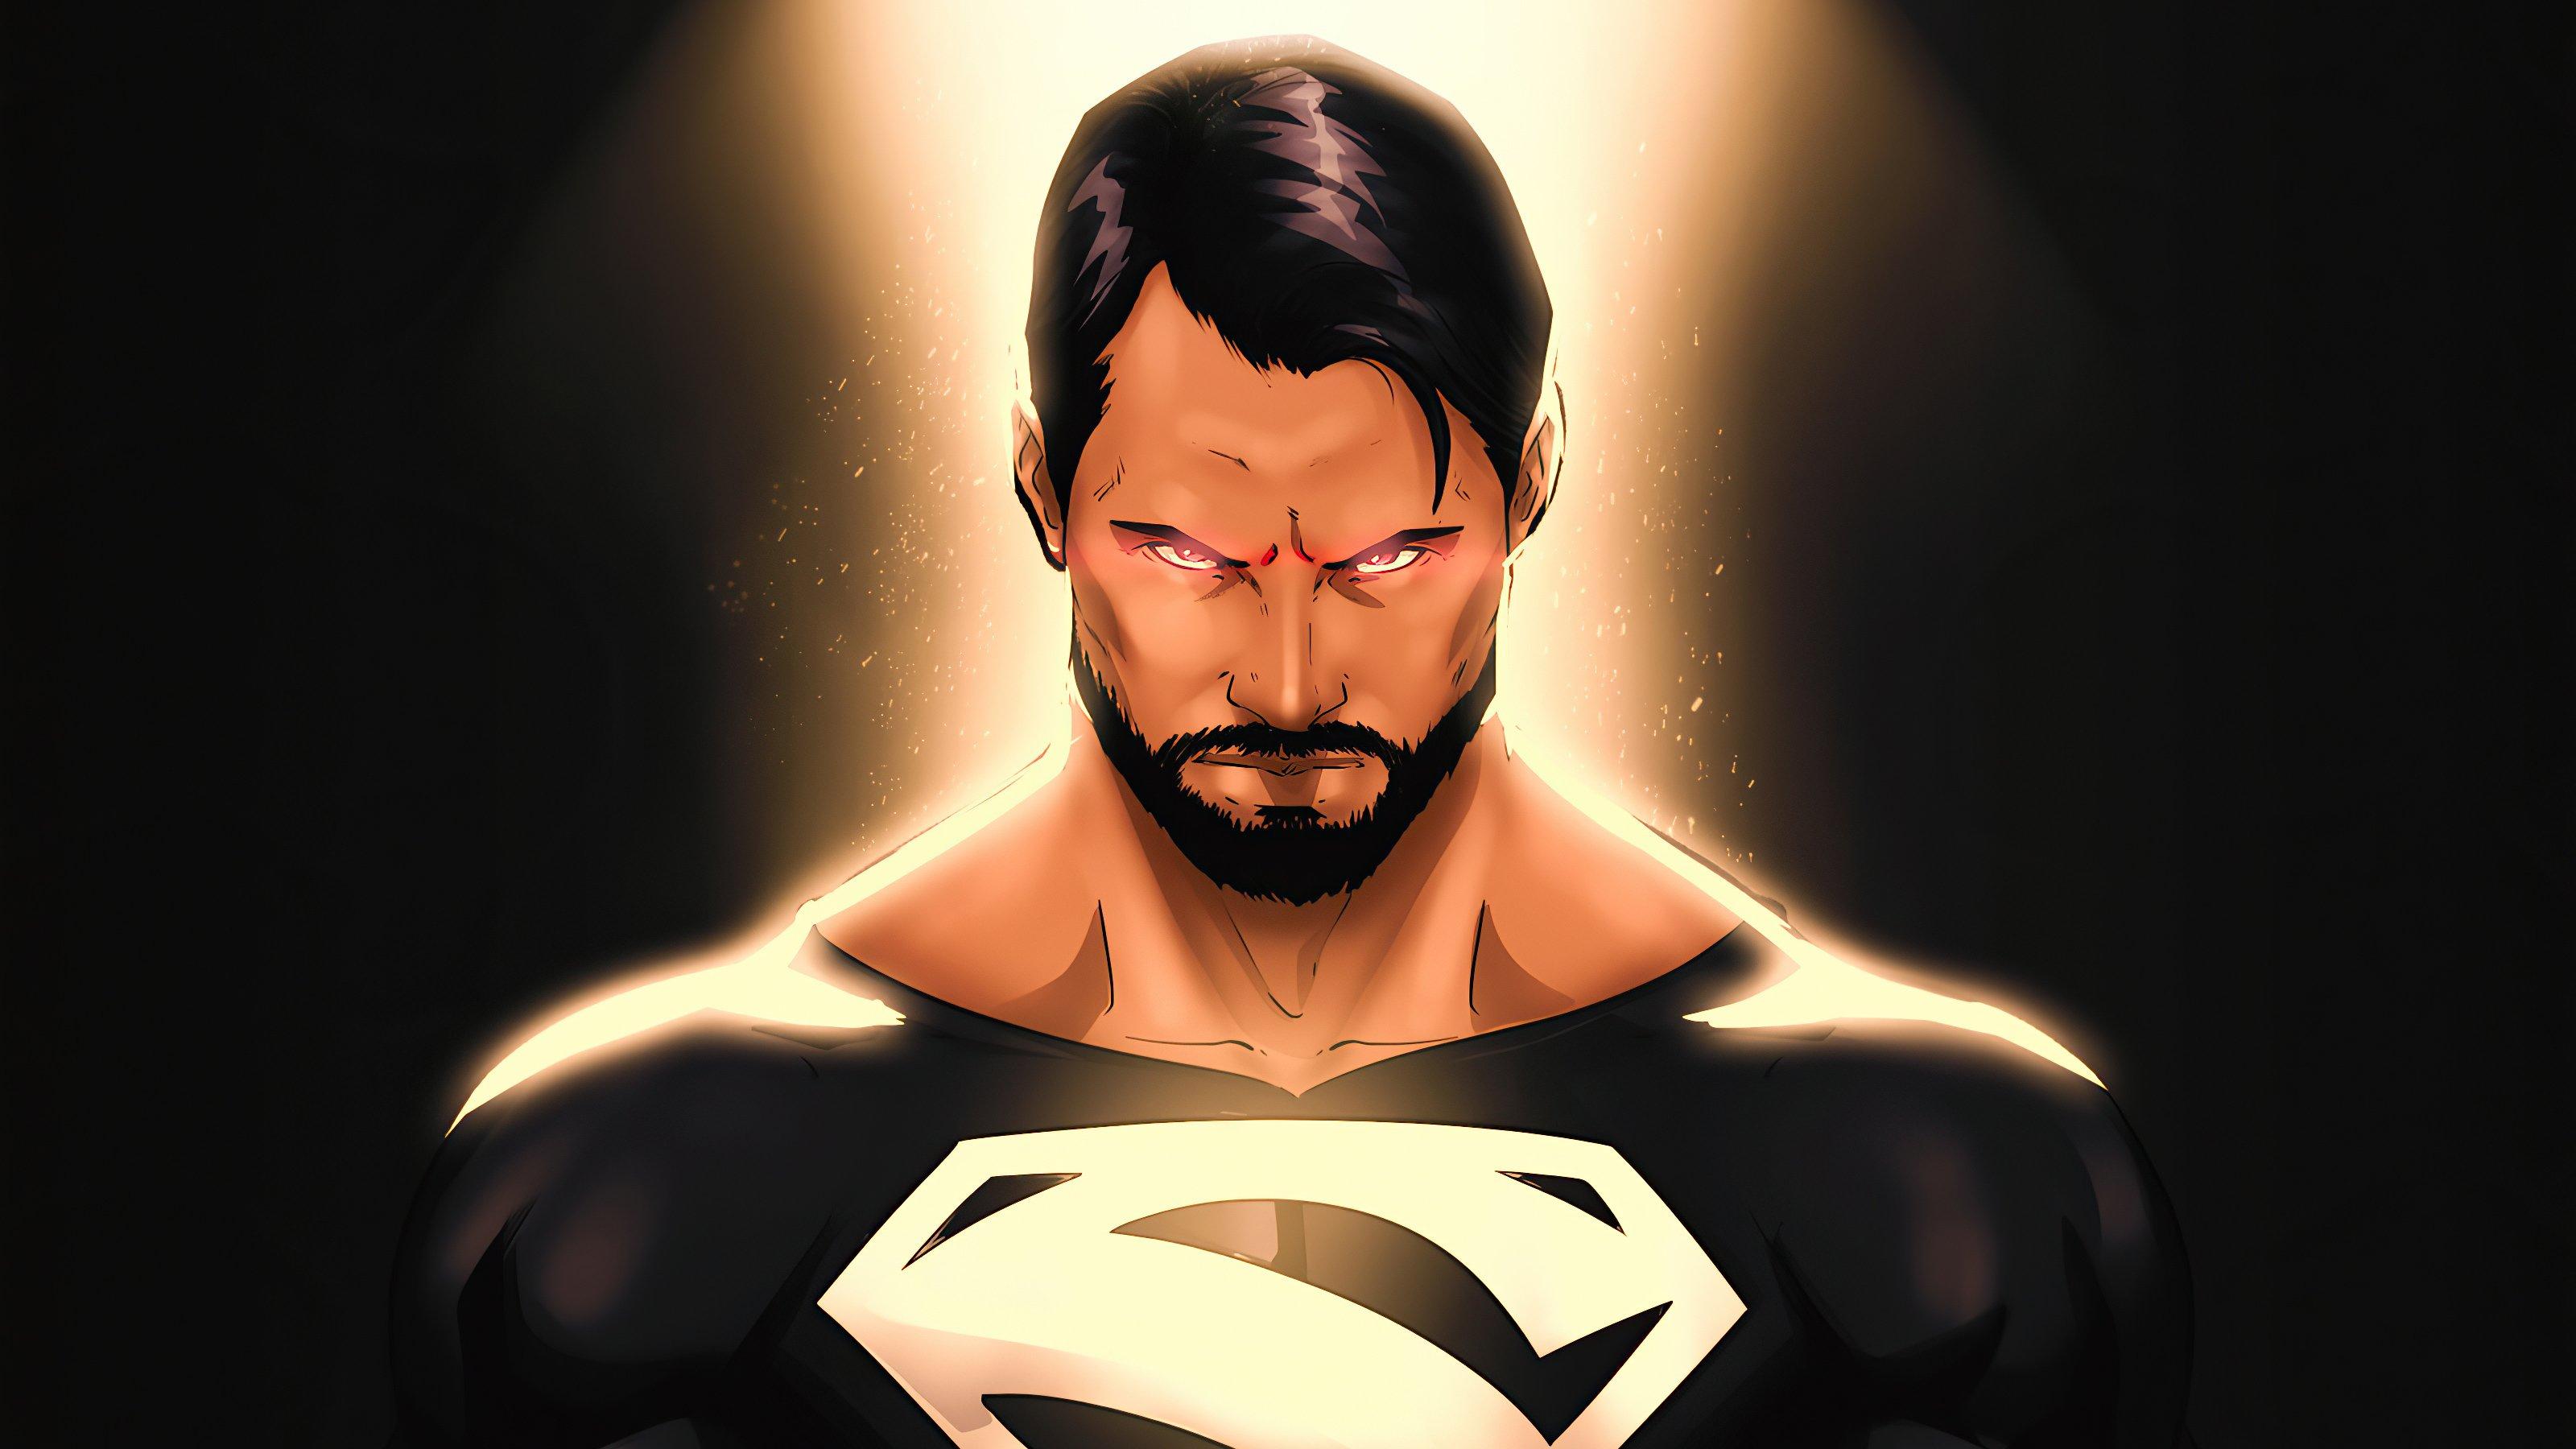 Wallpaper Superman with black suit